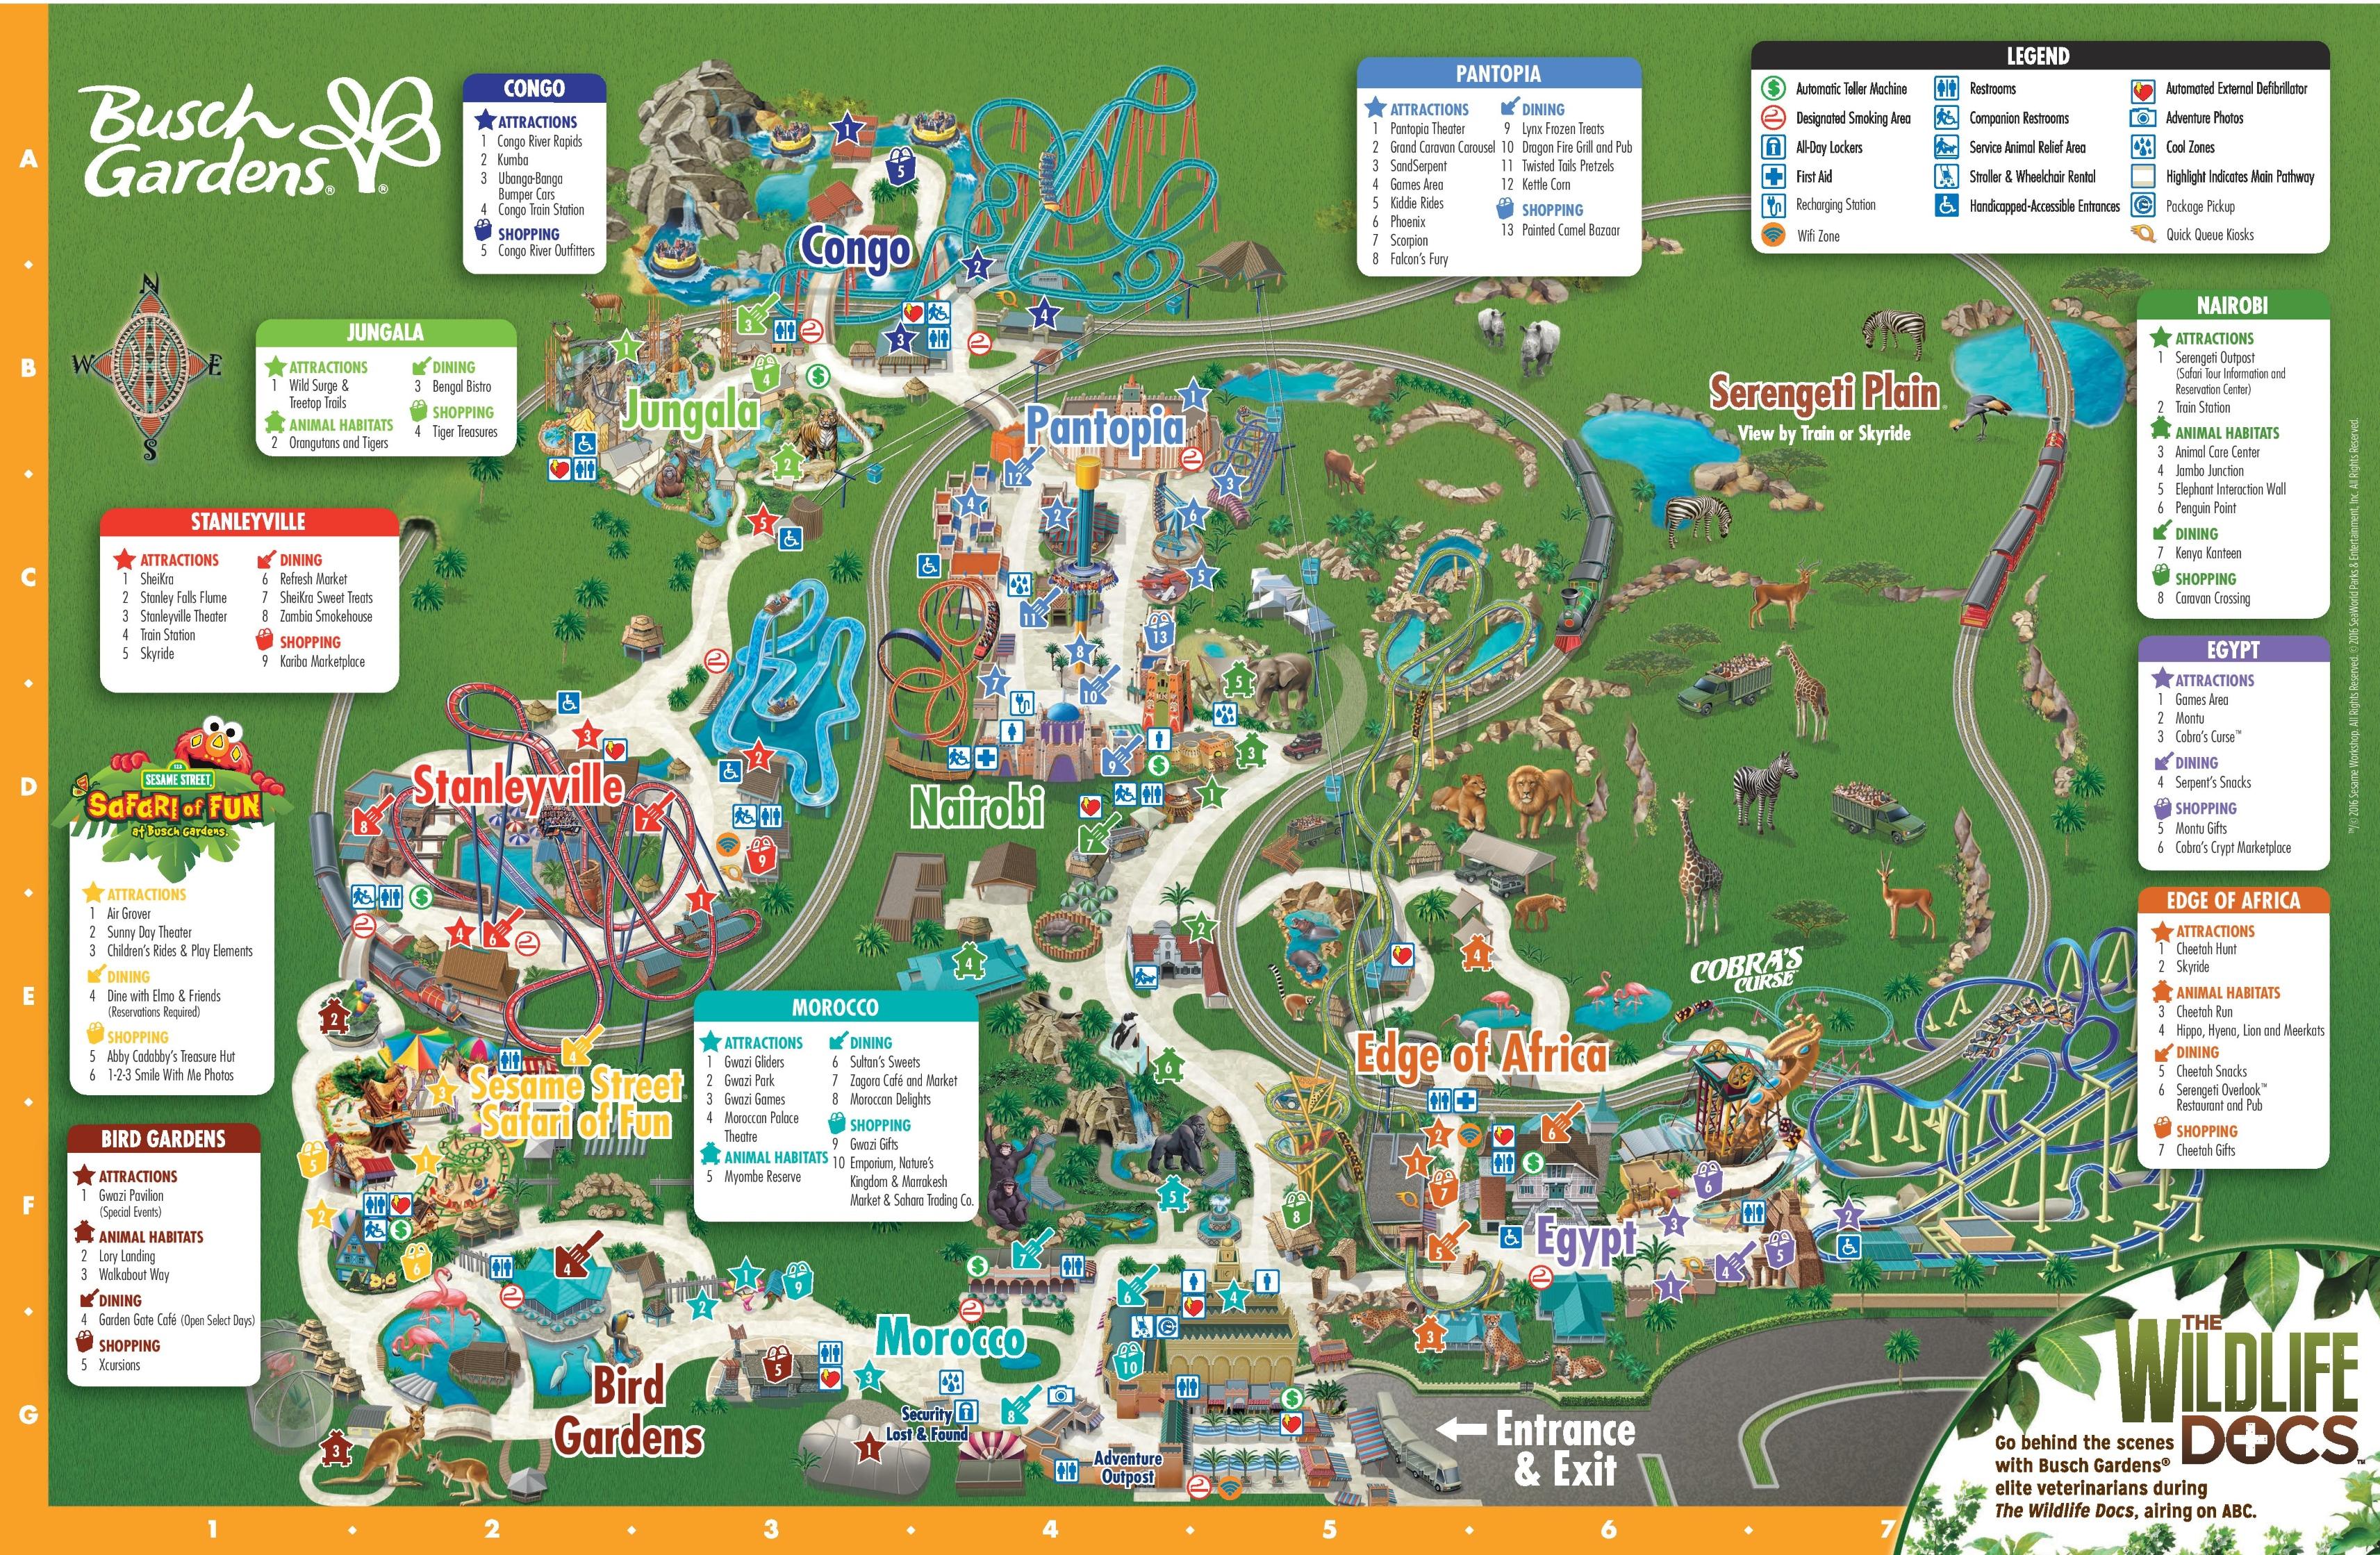 Tampa Busch Gardens Park Map - Florida Busch Gardens Map